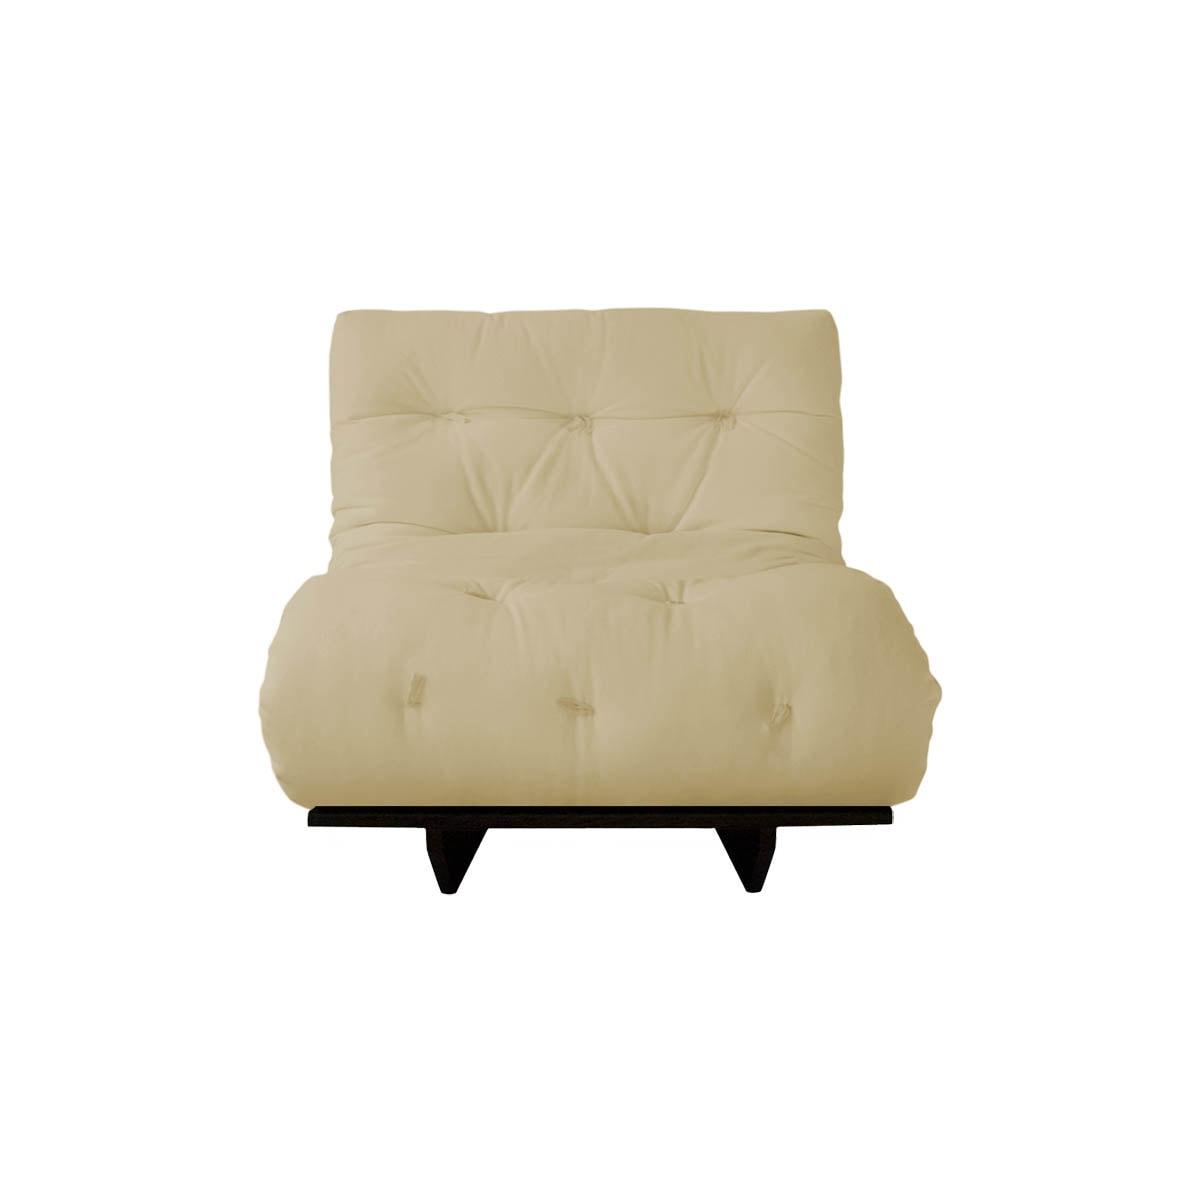 Futon sofa cama futon company - Sofas cama futon ...